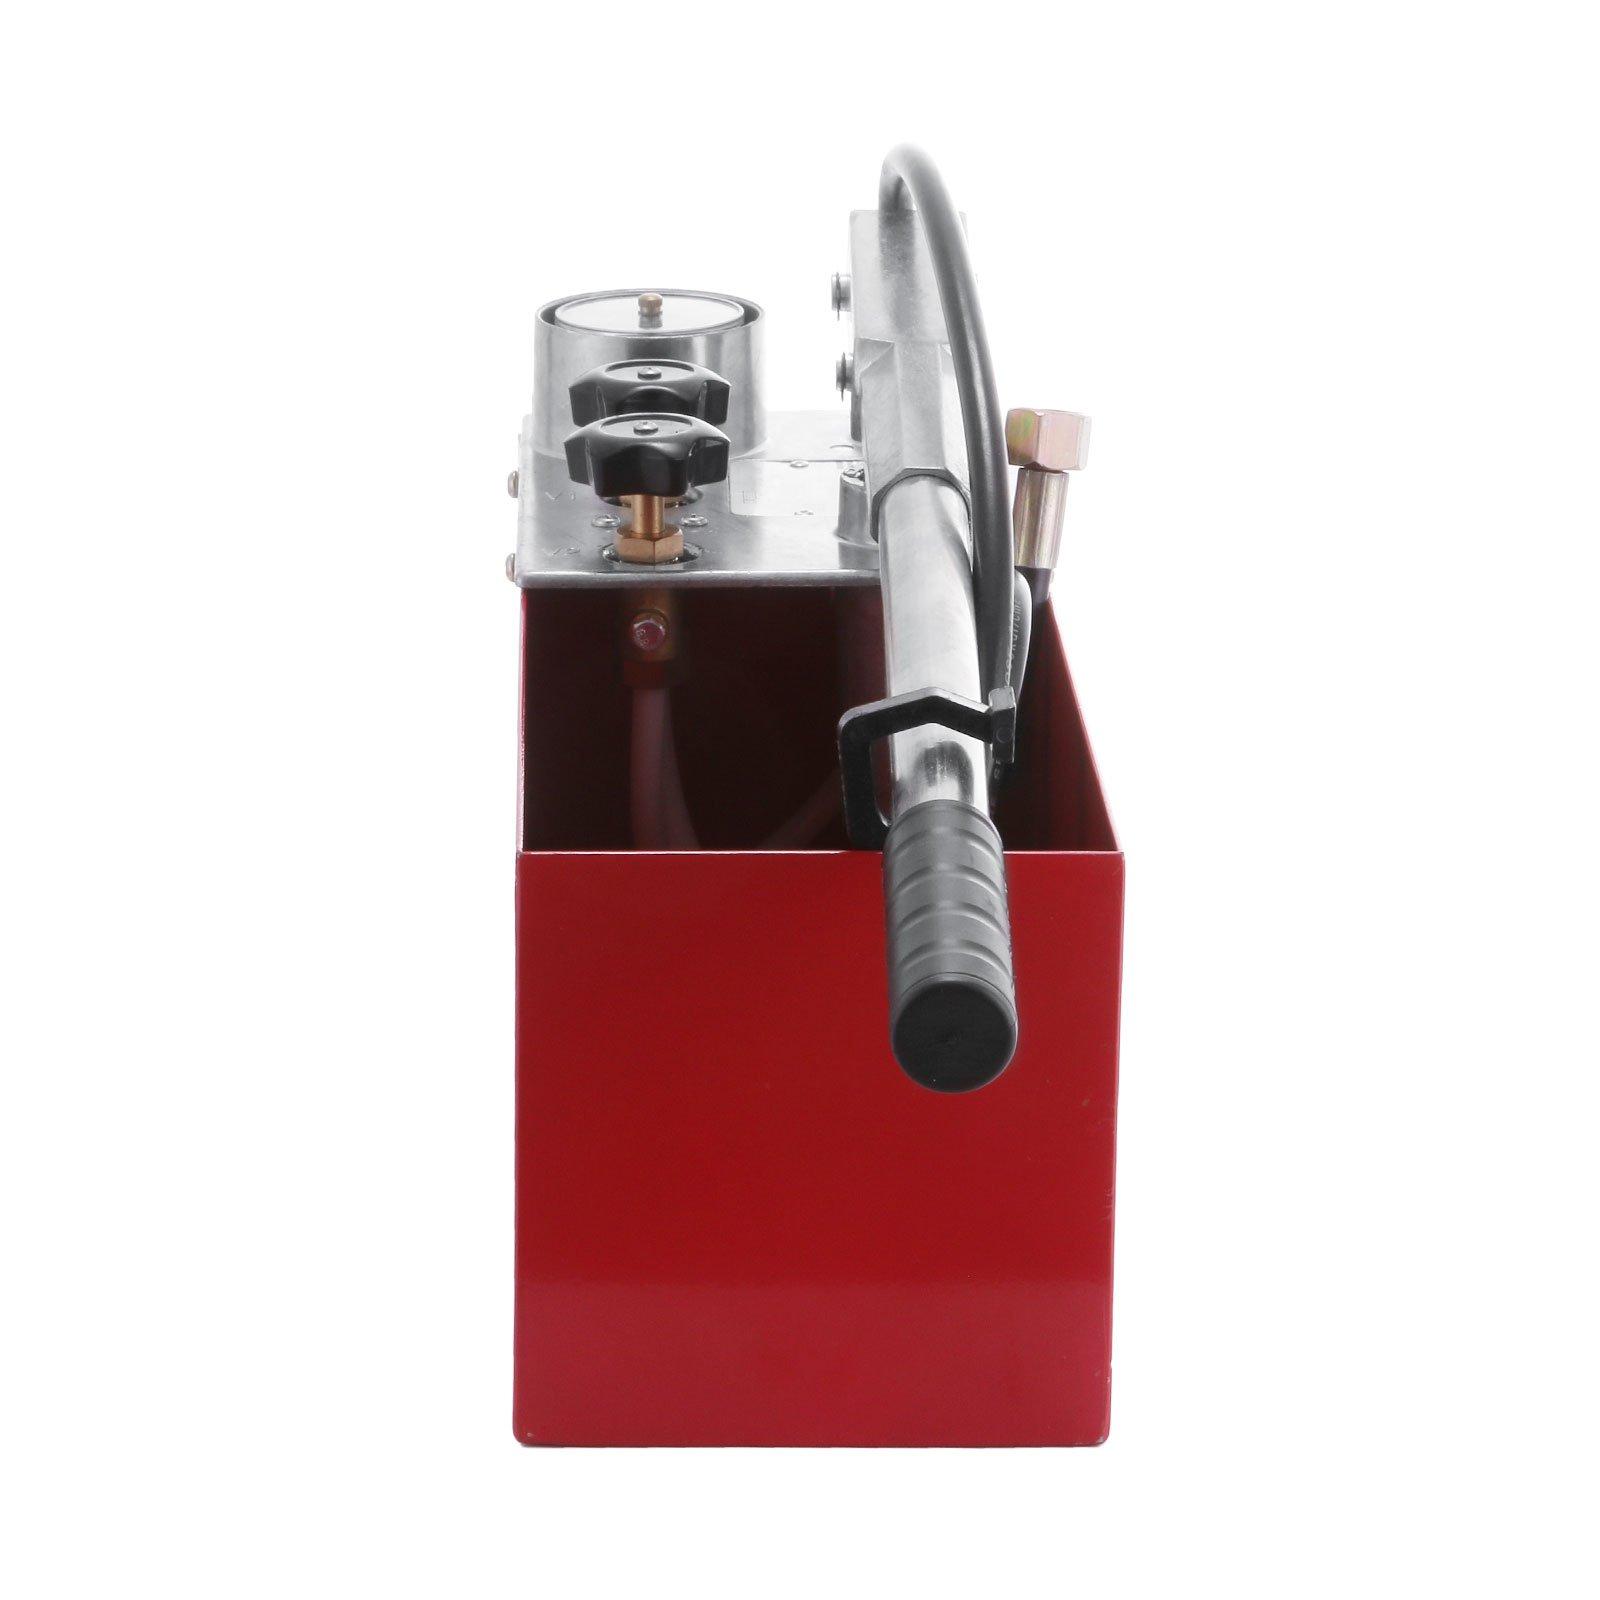 "VEVOR Hydraulic Pressure Test Pump 50 Bar Hand Pressure Test Pump 726 PSI 3 Gallon Tank 45ML 1/2"" BSP Hydrostatic Test Pump for Pipeline Pressure Container Irrigation Firemen (Test Pump 50 Bar)"